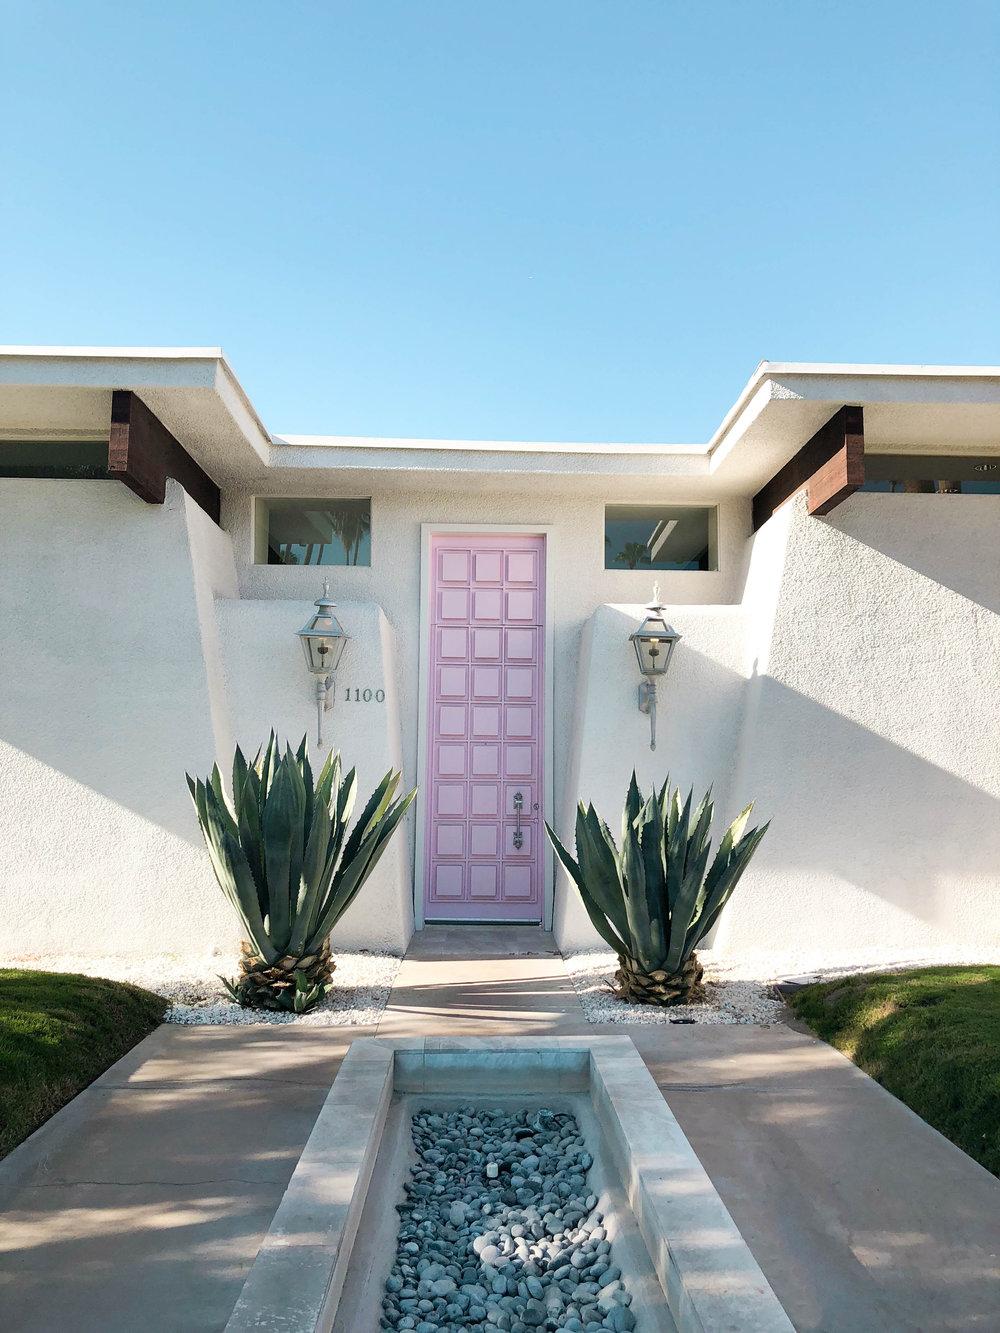 Address: 1100 Sierra Way, Palm Springs